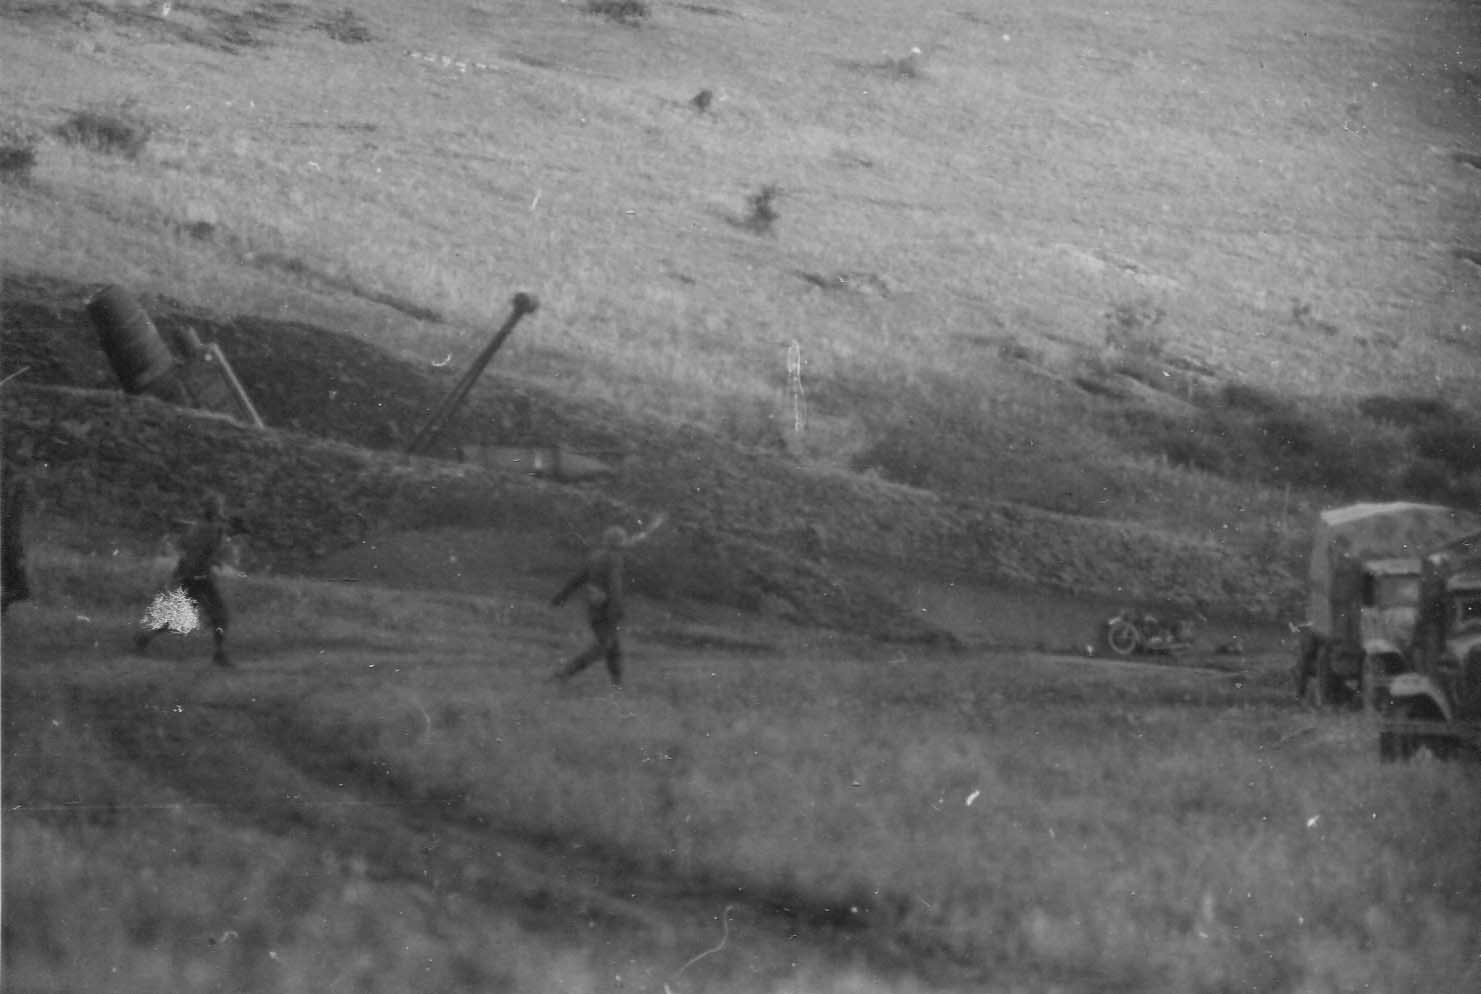 Morser Karl Gerat Sevastopol 1942